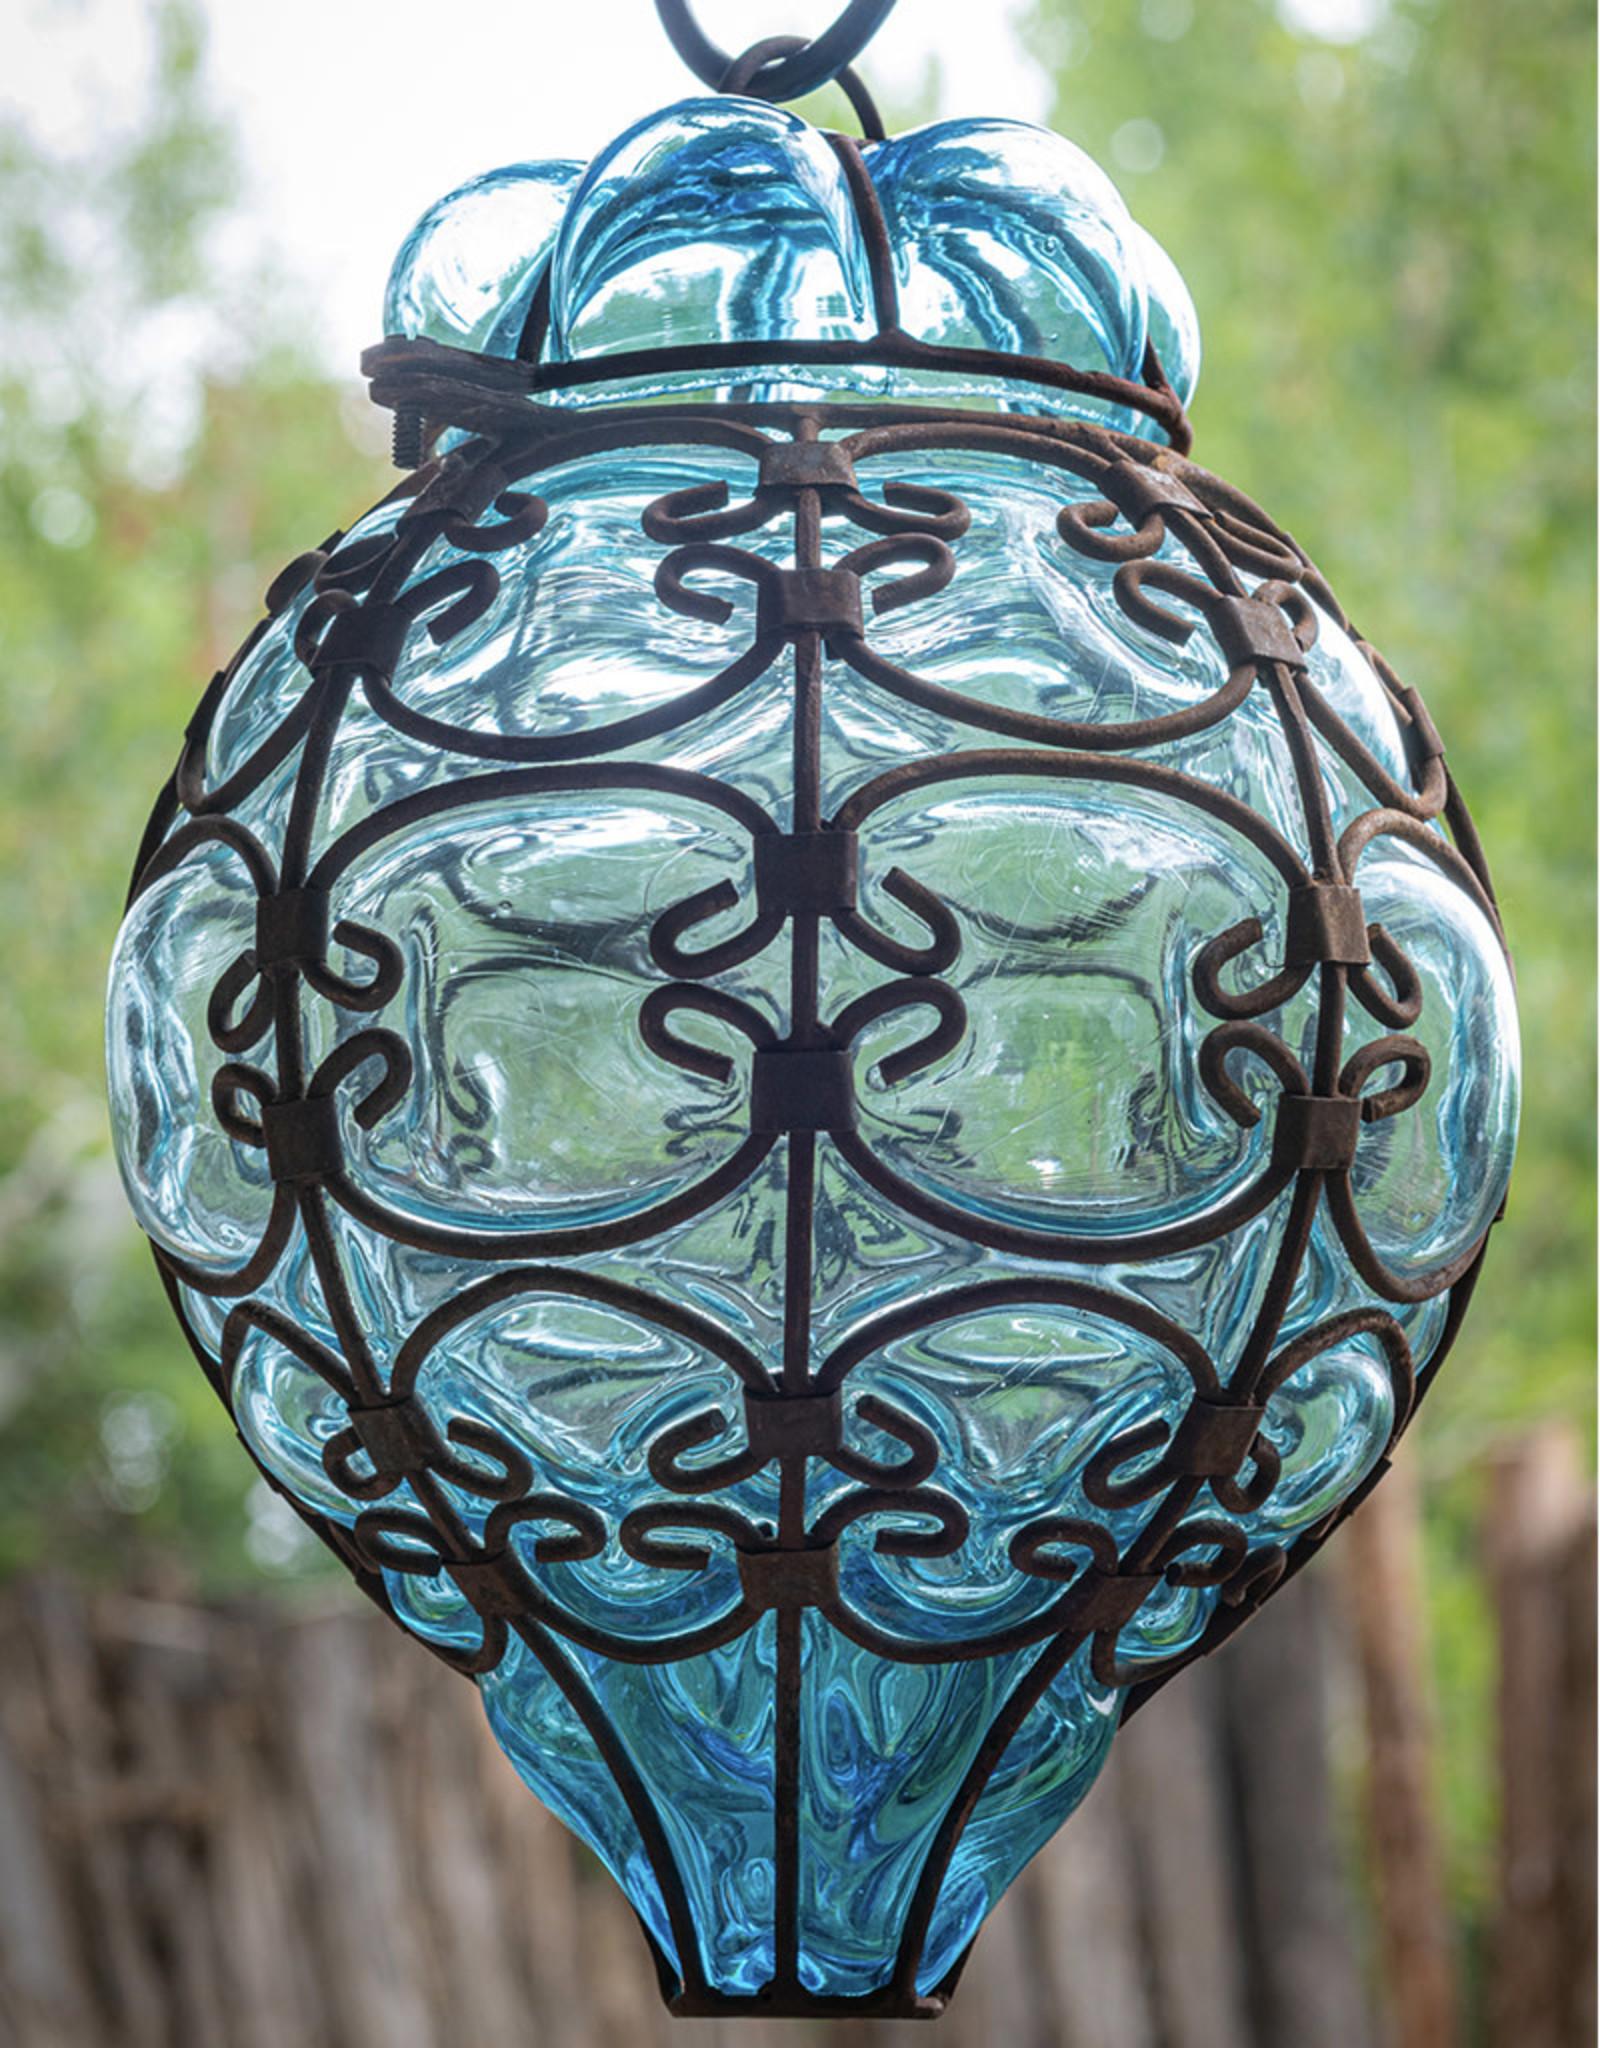 Salaheddin Venetian Lantern Turquoise